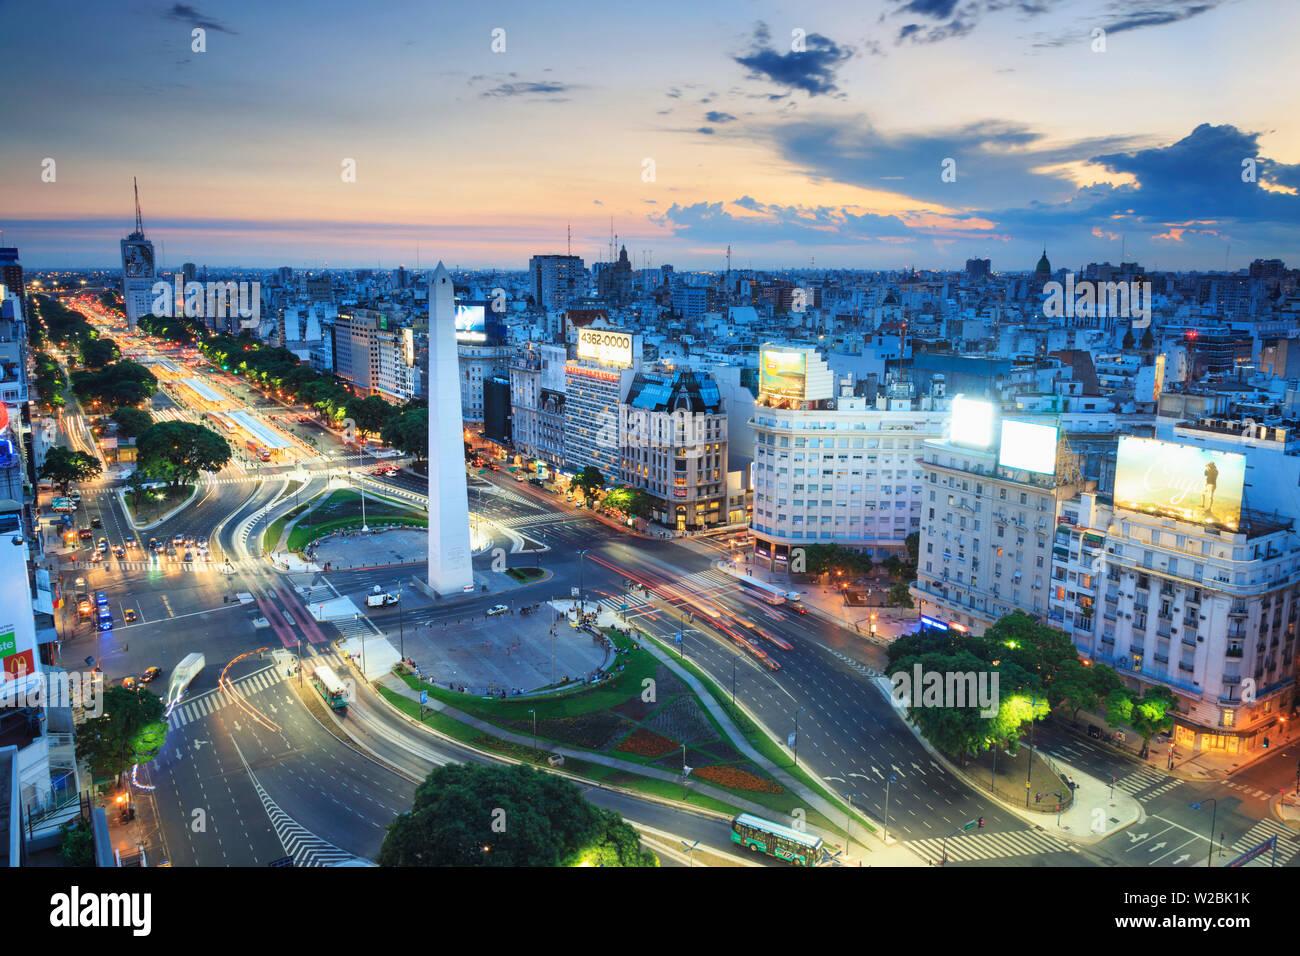 Argentina, Buenos Aires, Avenida 9 de Julio and Obelisk - Stock Image